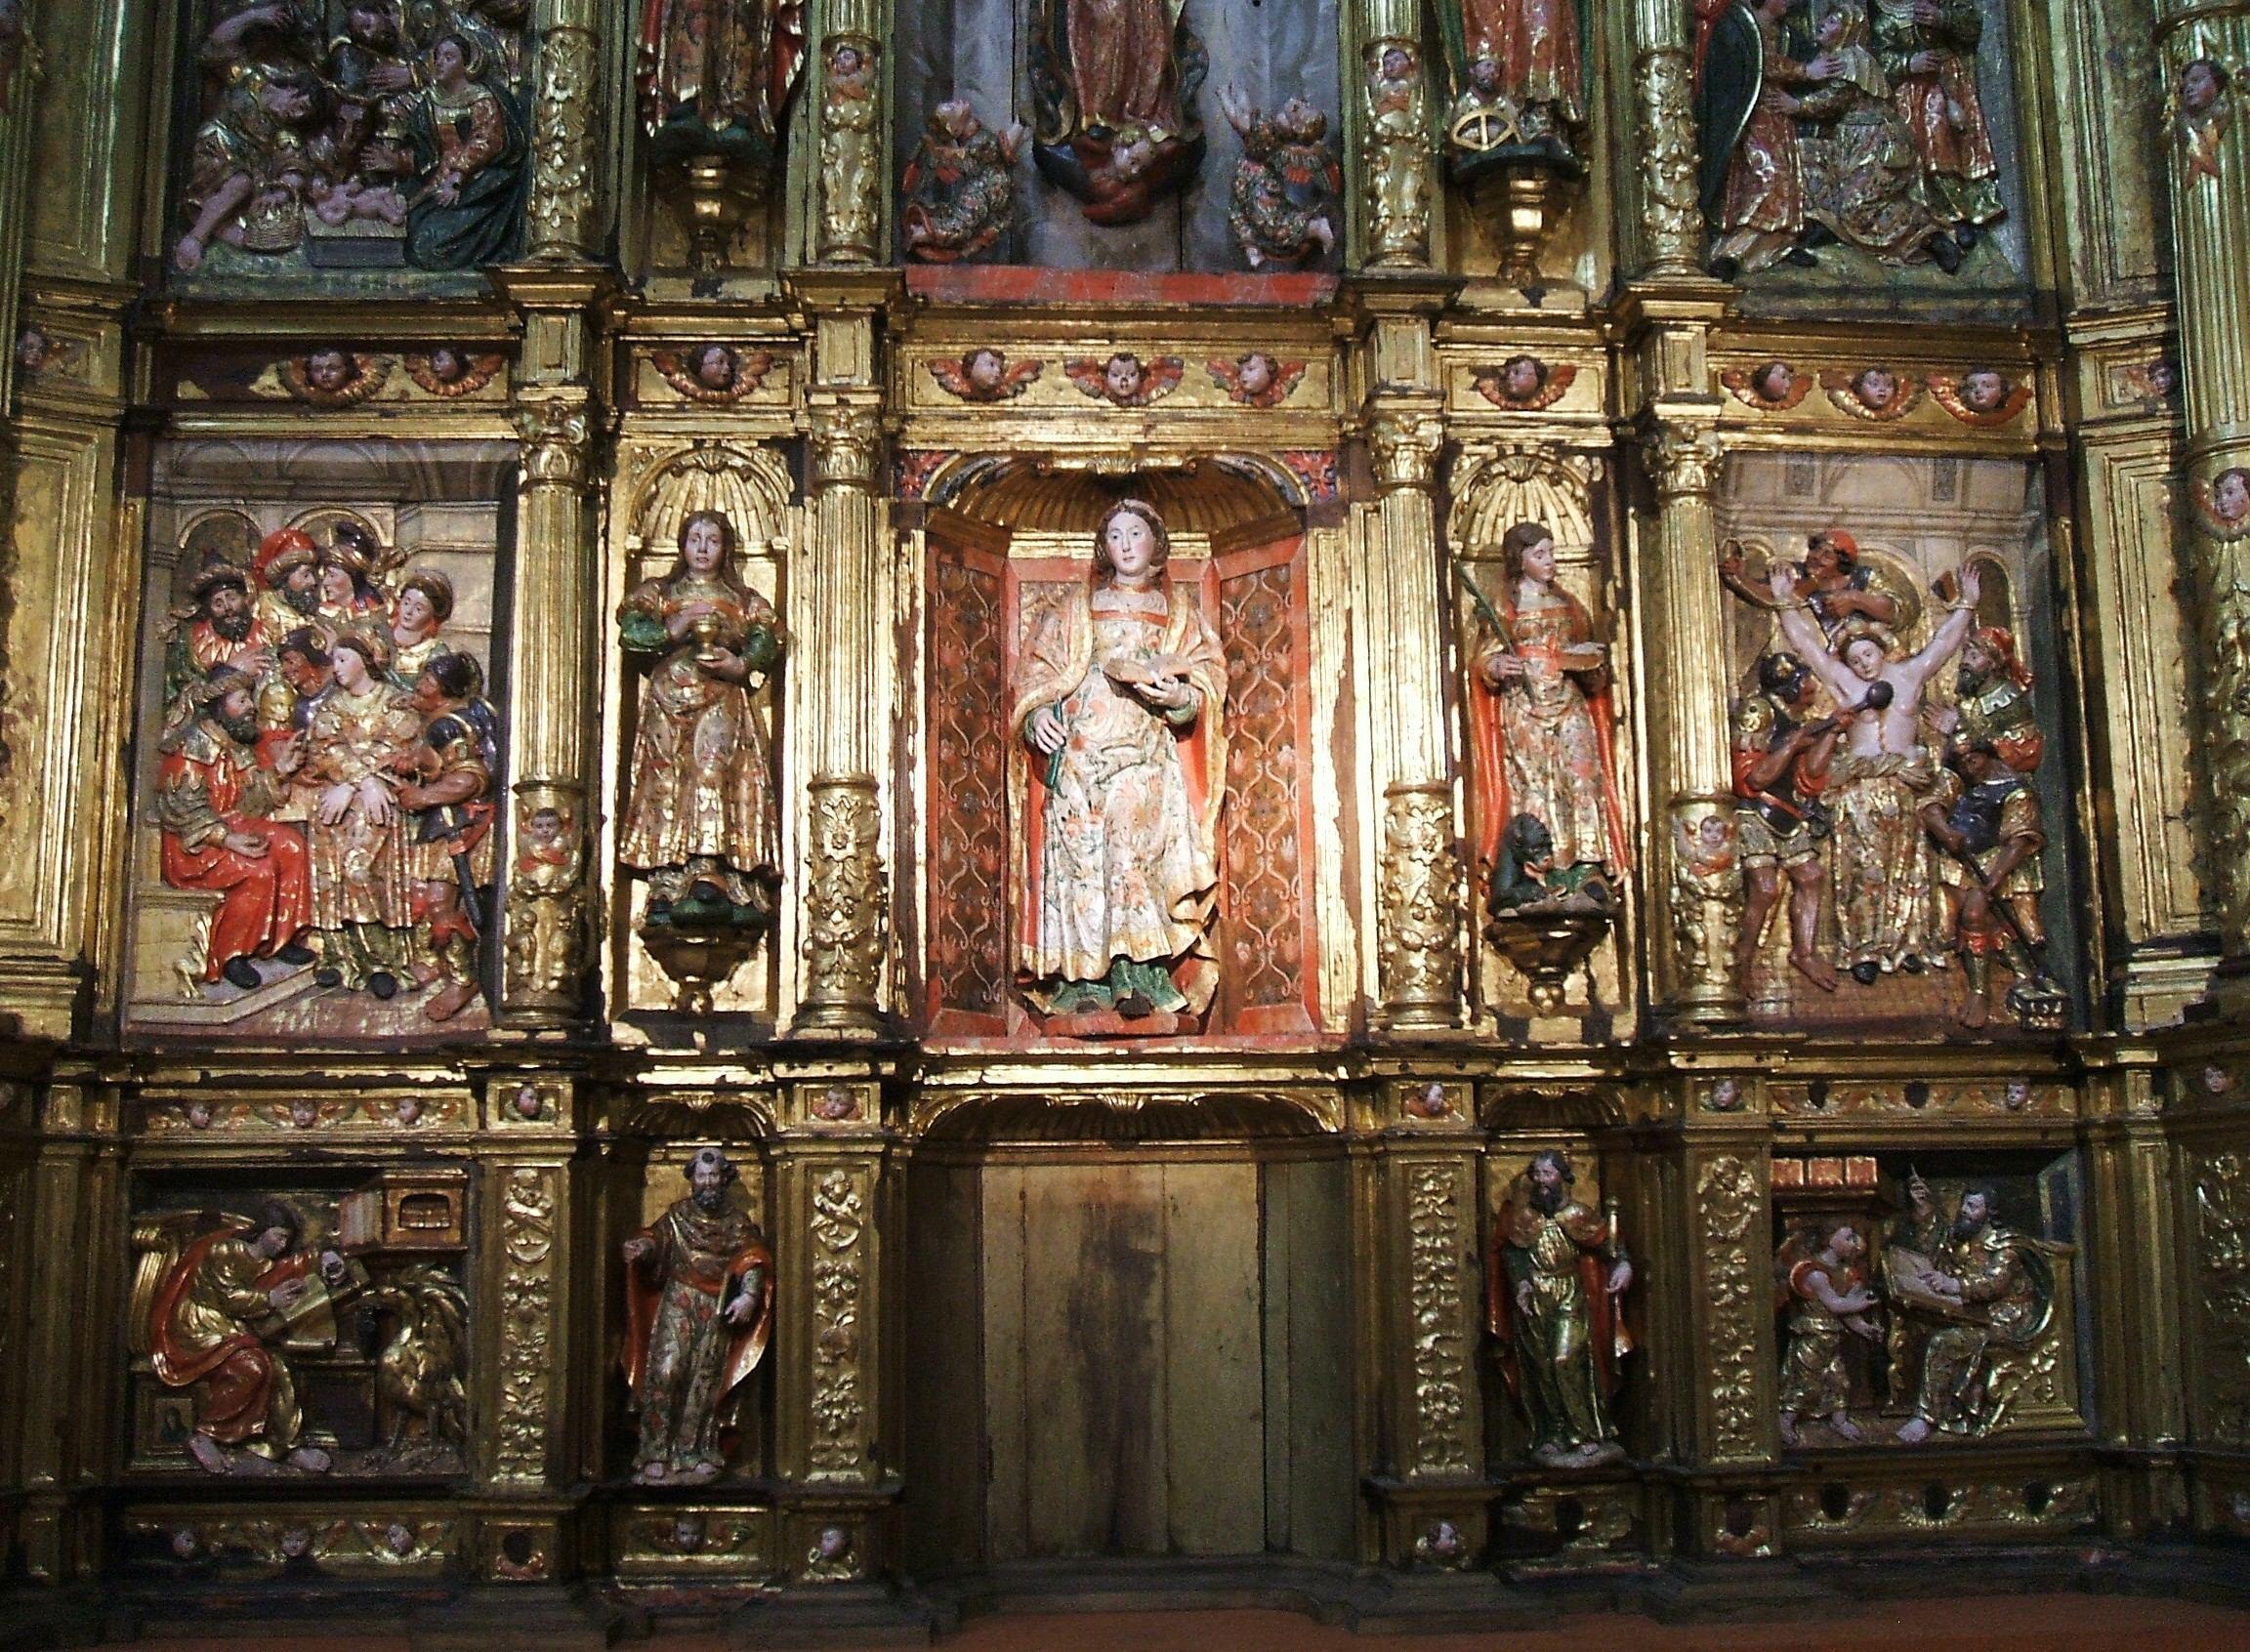 http://upload.wikimedia.org/wikipedia/commons/c/cf/Vitoria_-_Museo_de_Arte_Sacro_43.JPG